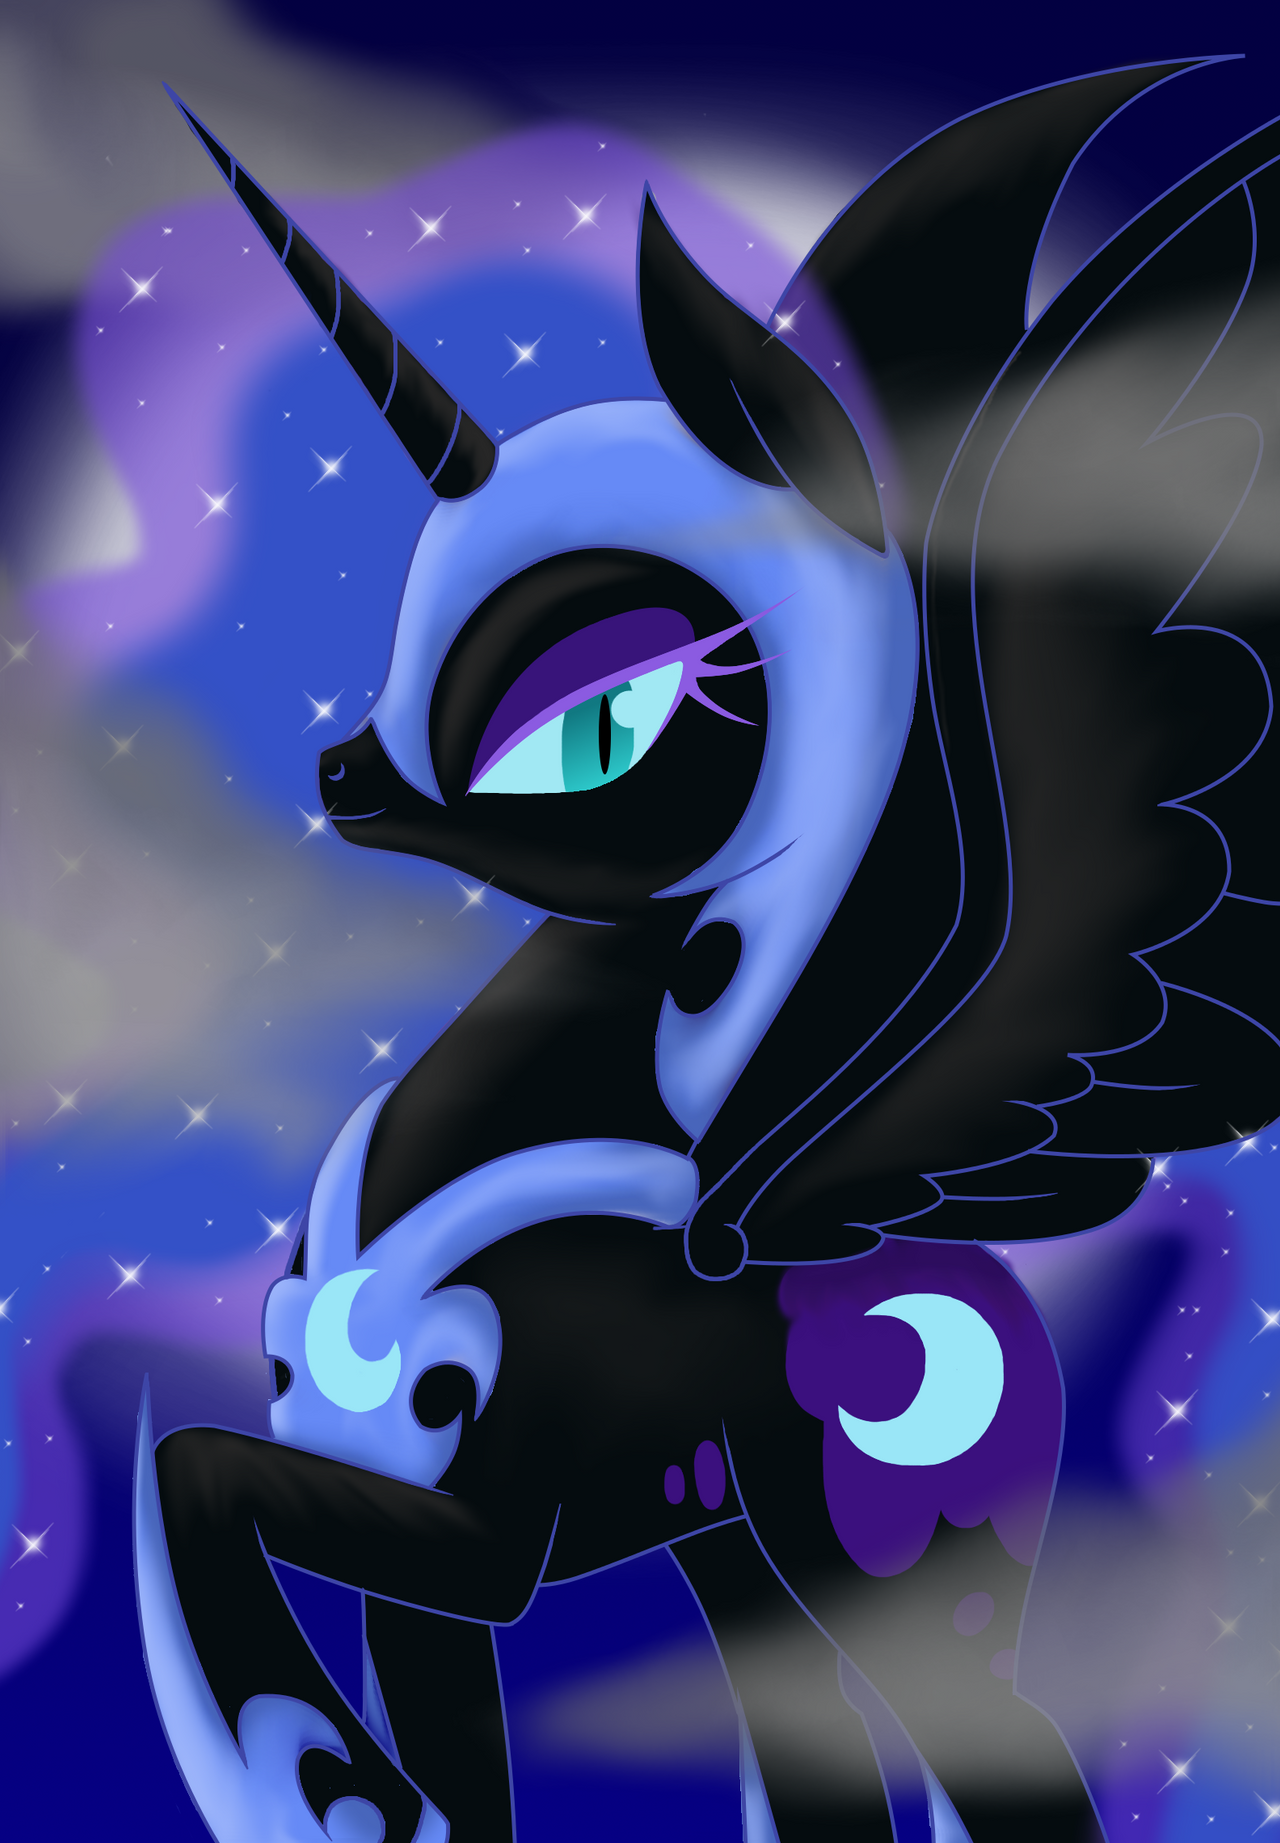 Nightmare Moon by phoenixflorid on DeviantArt   Nightmare Moon Moon